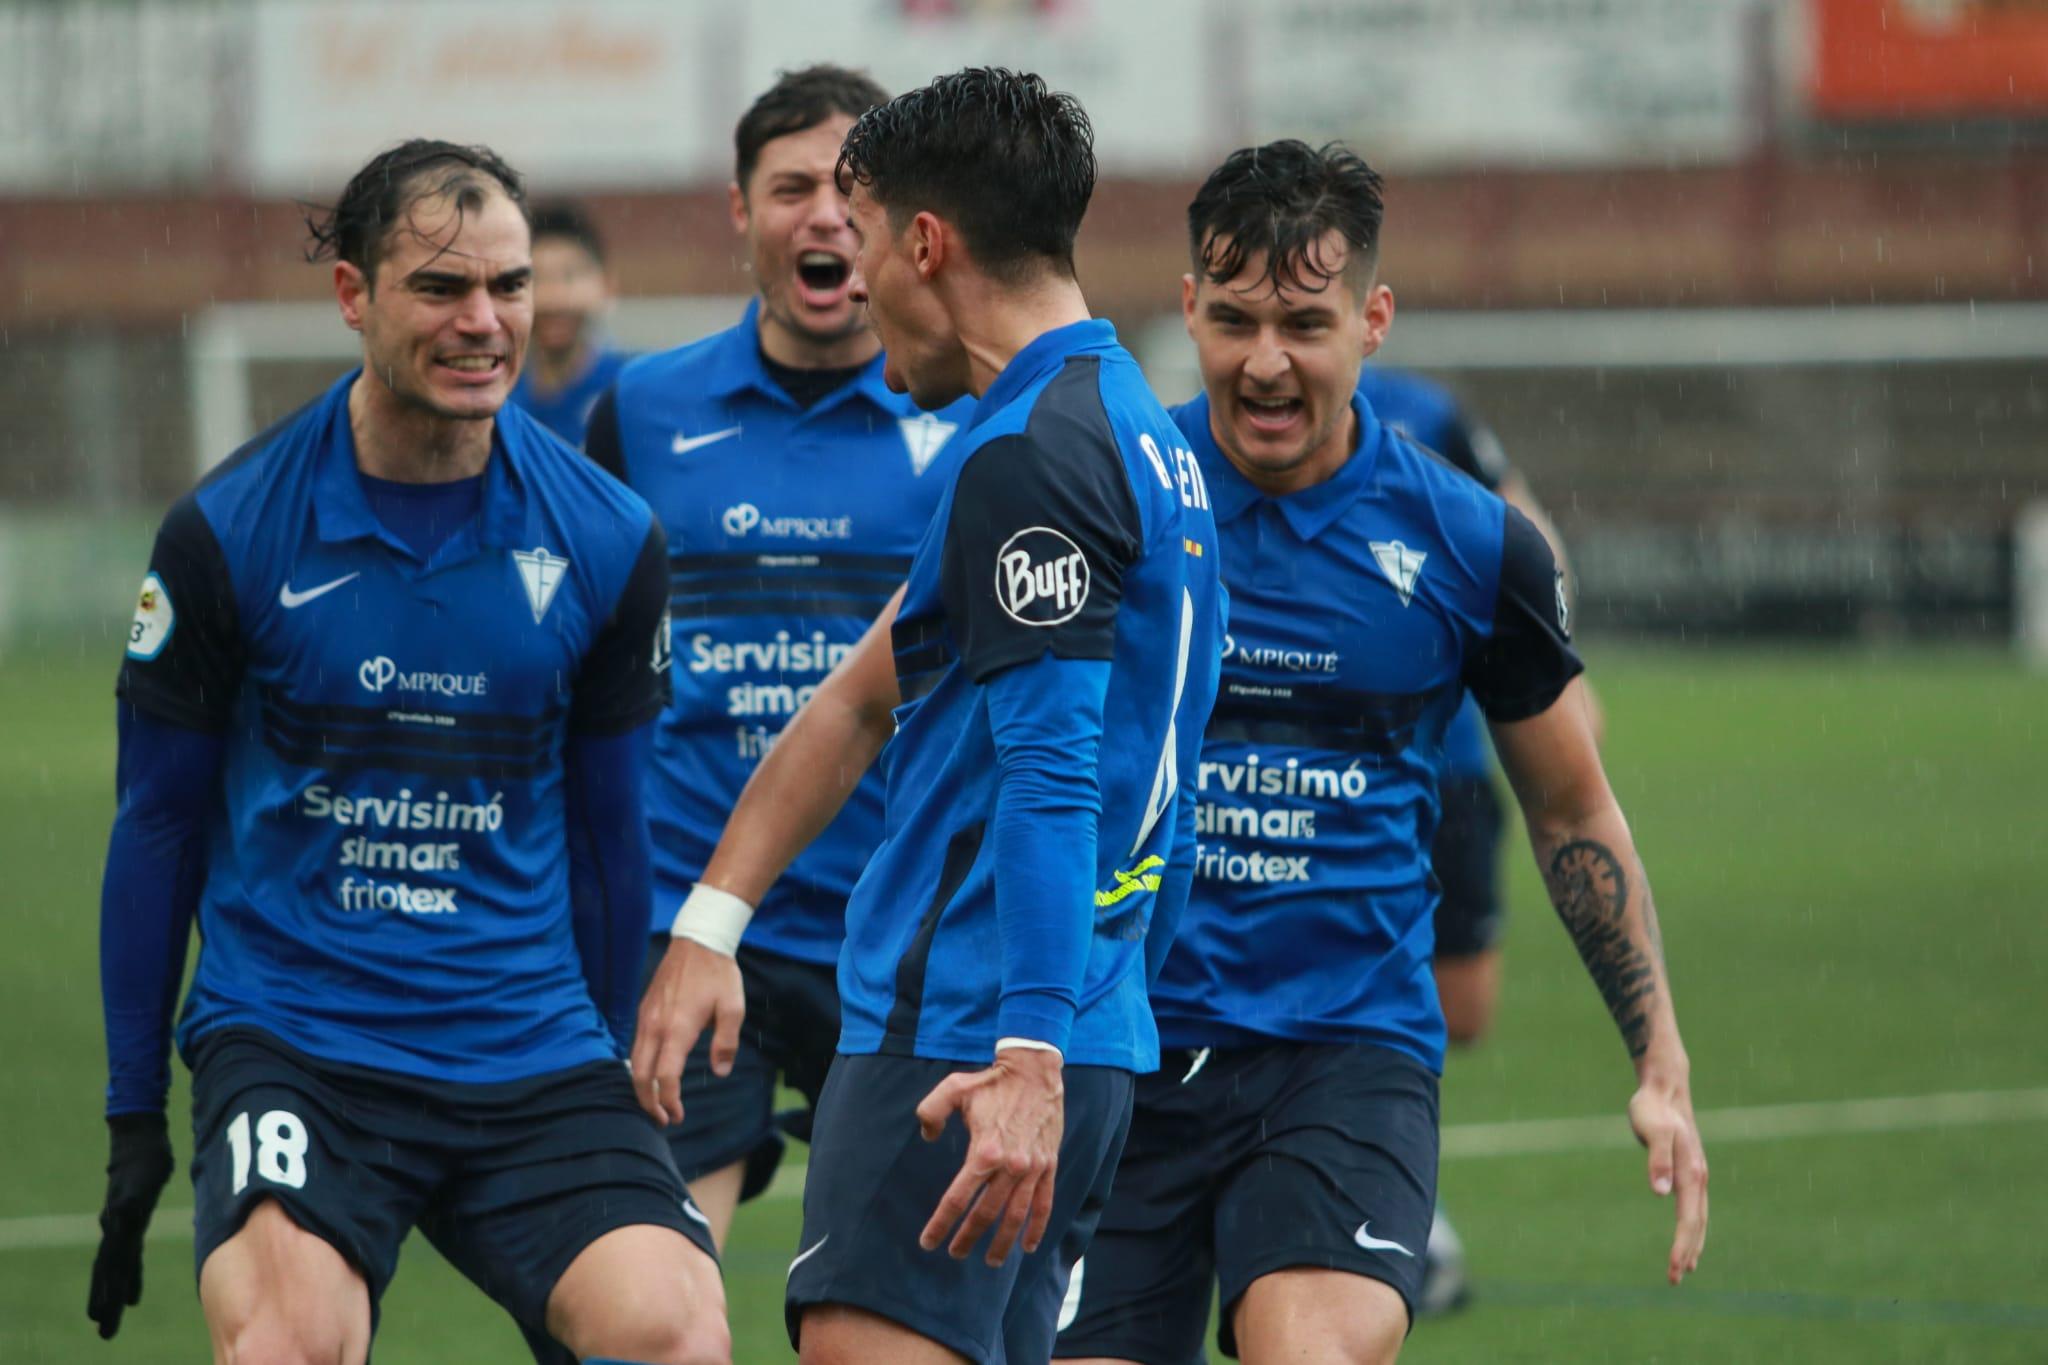 CF IGUALADA 2-1 UE SANTS